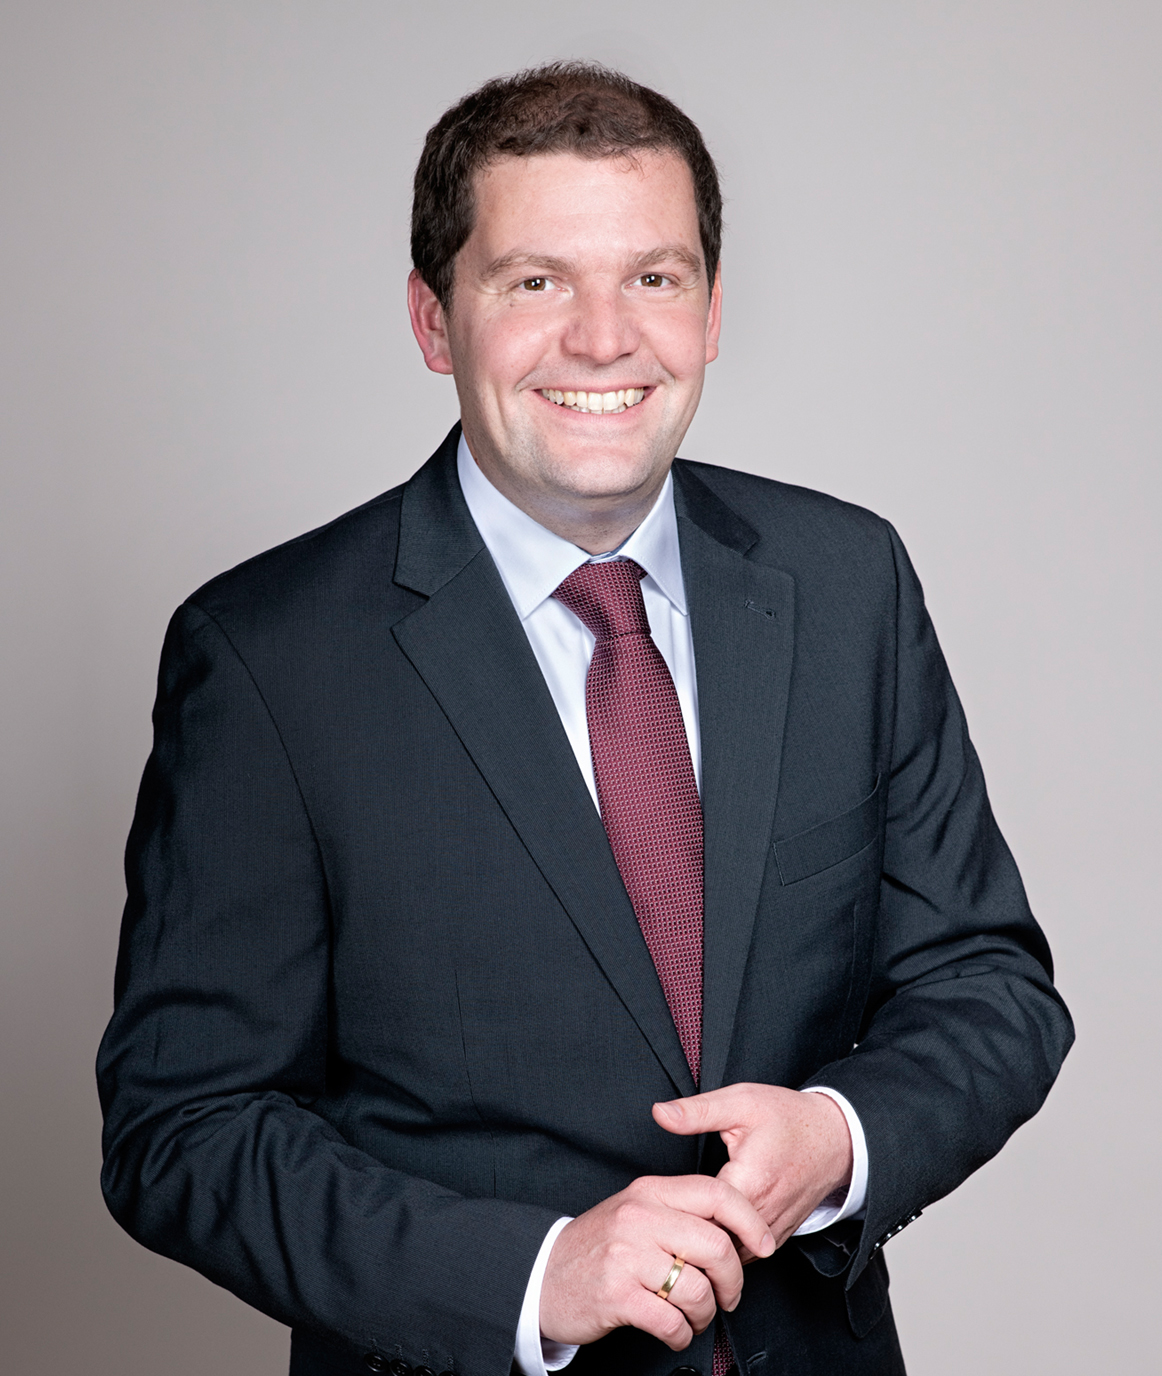 Dr. Christian Kau